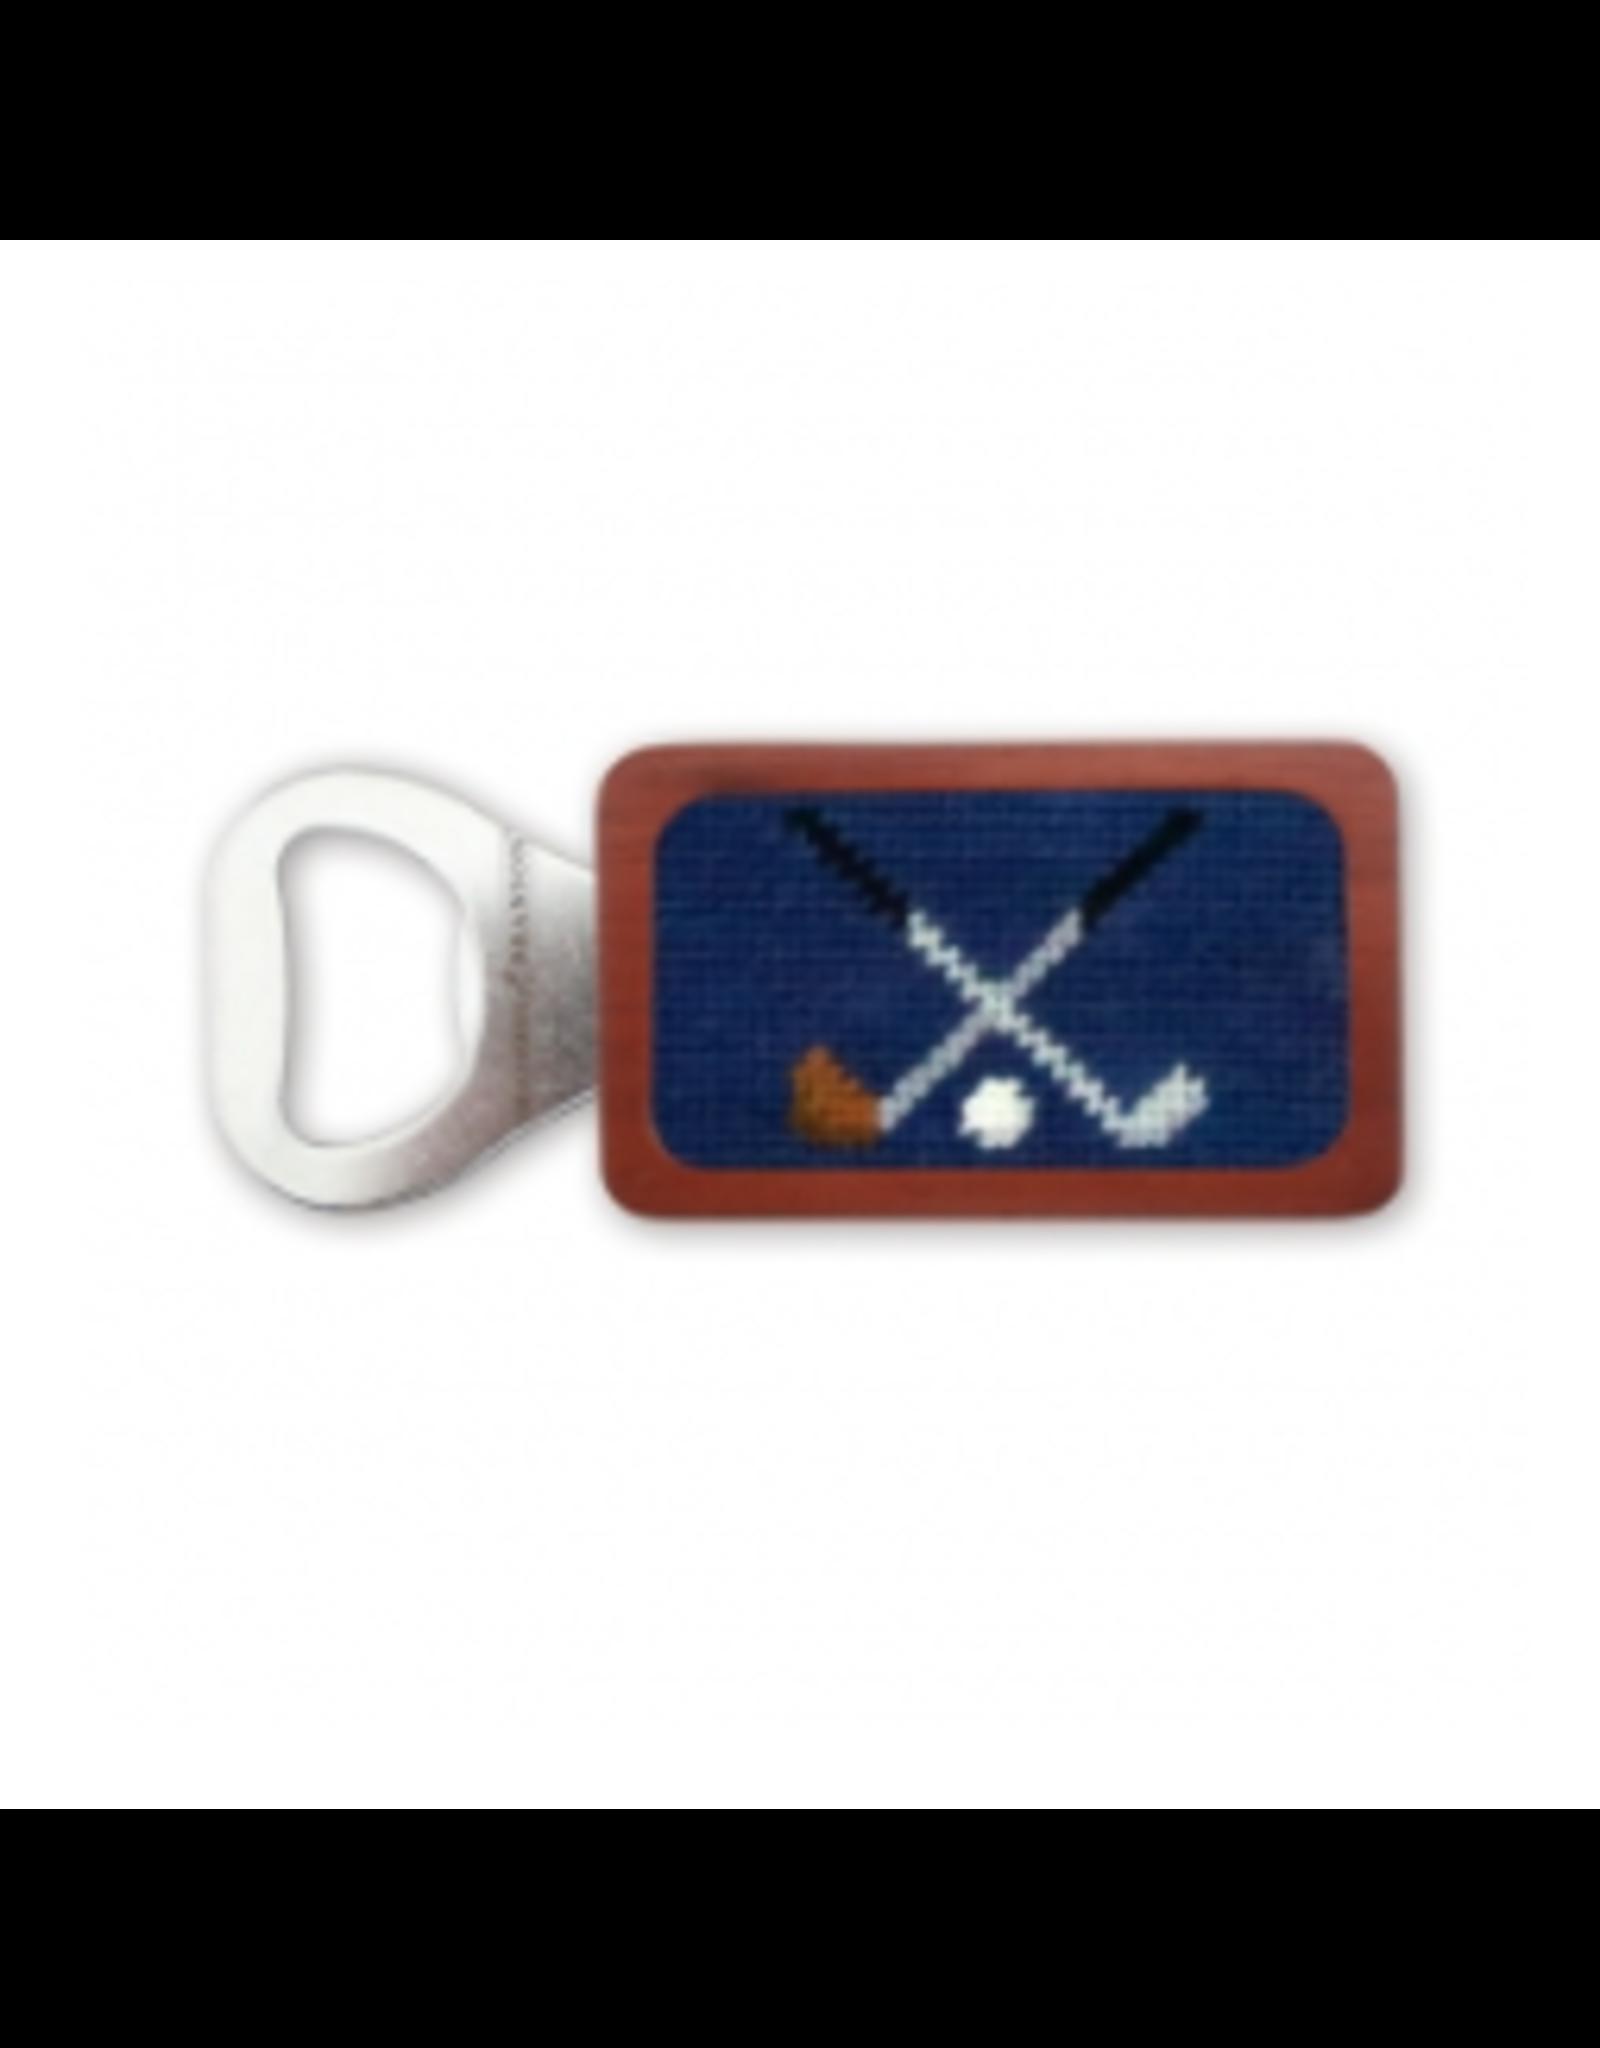 Smathers & Branson S&B Needlepoint Bottle Opener, Cross Clubs (classic navy)